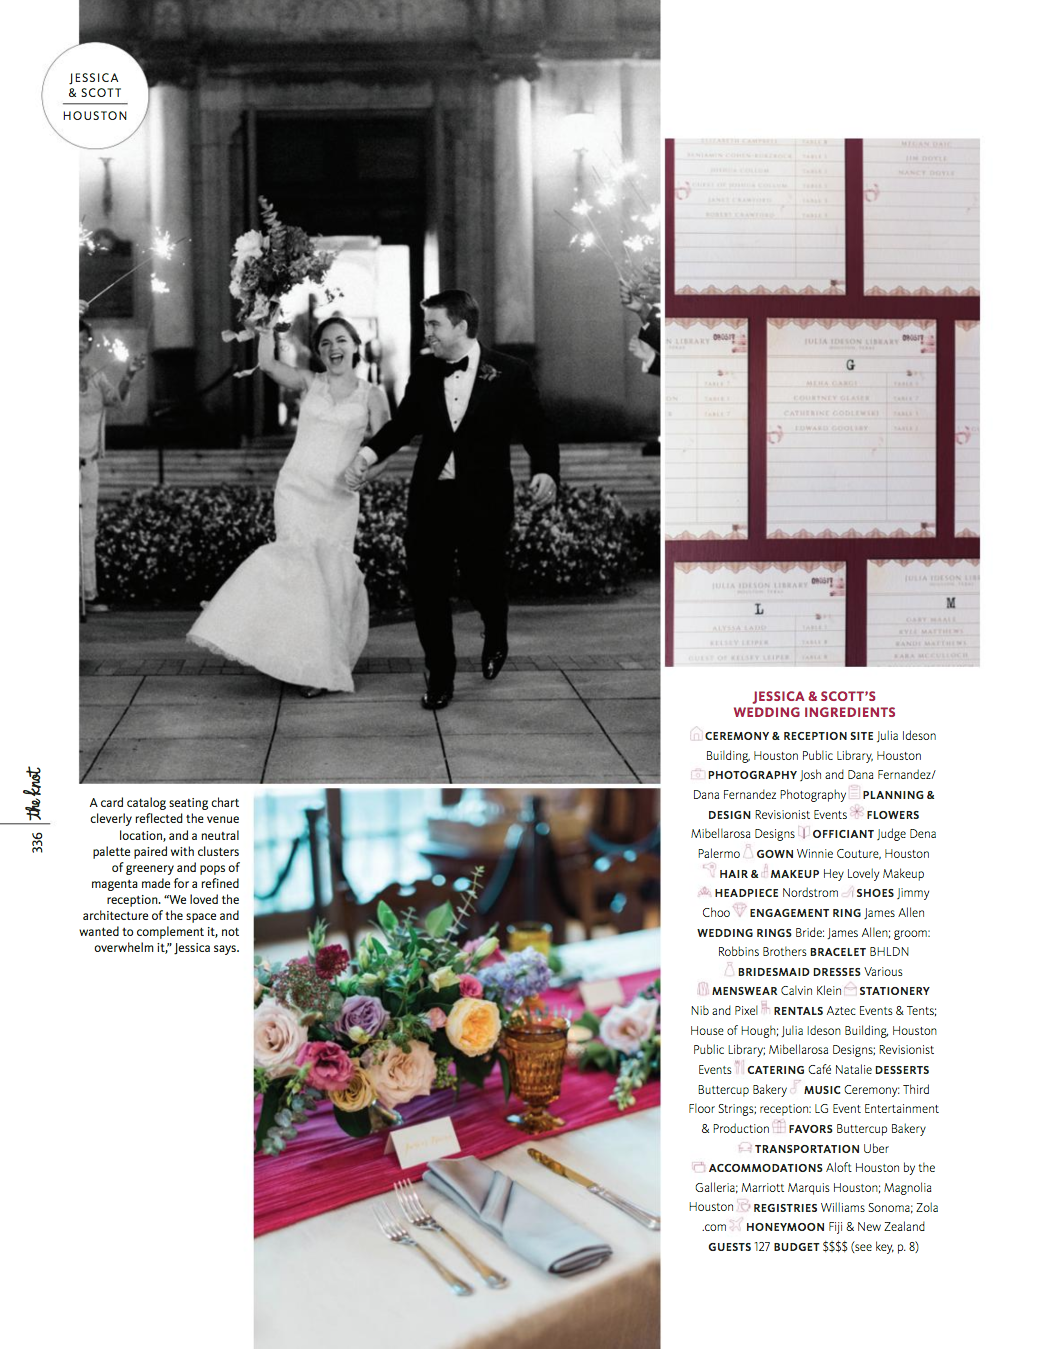 The-Knot-Texas-Fine-Art-Wedding-Film-Destination-Photographer-Houston-Austin-Dallas-New-Orleans-Julia-Ideson-Library-Event-Dana-Josh-Fernandez-Photograph-Top-Best-3838.png